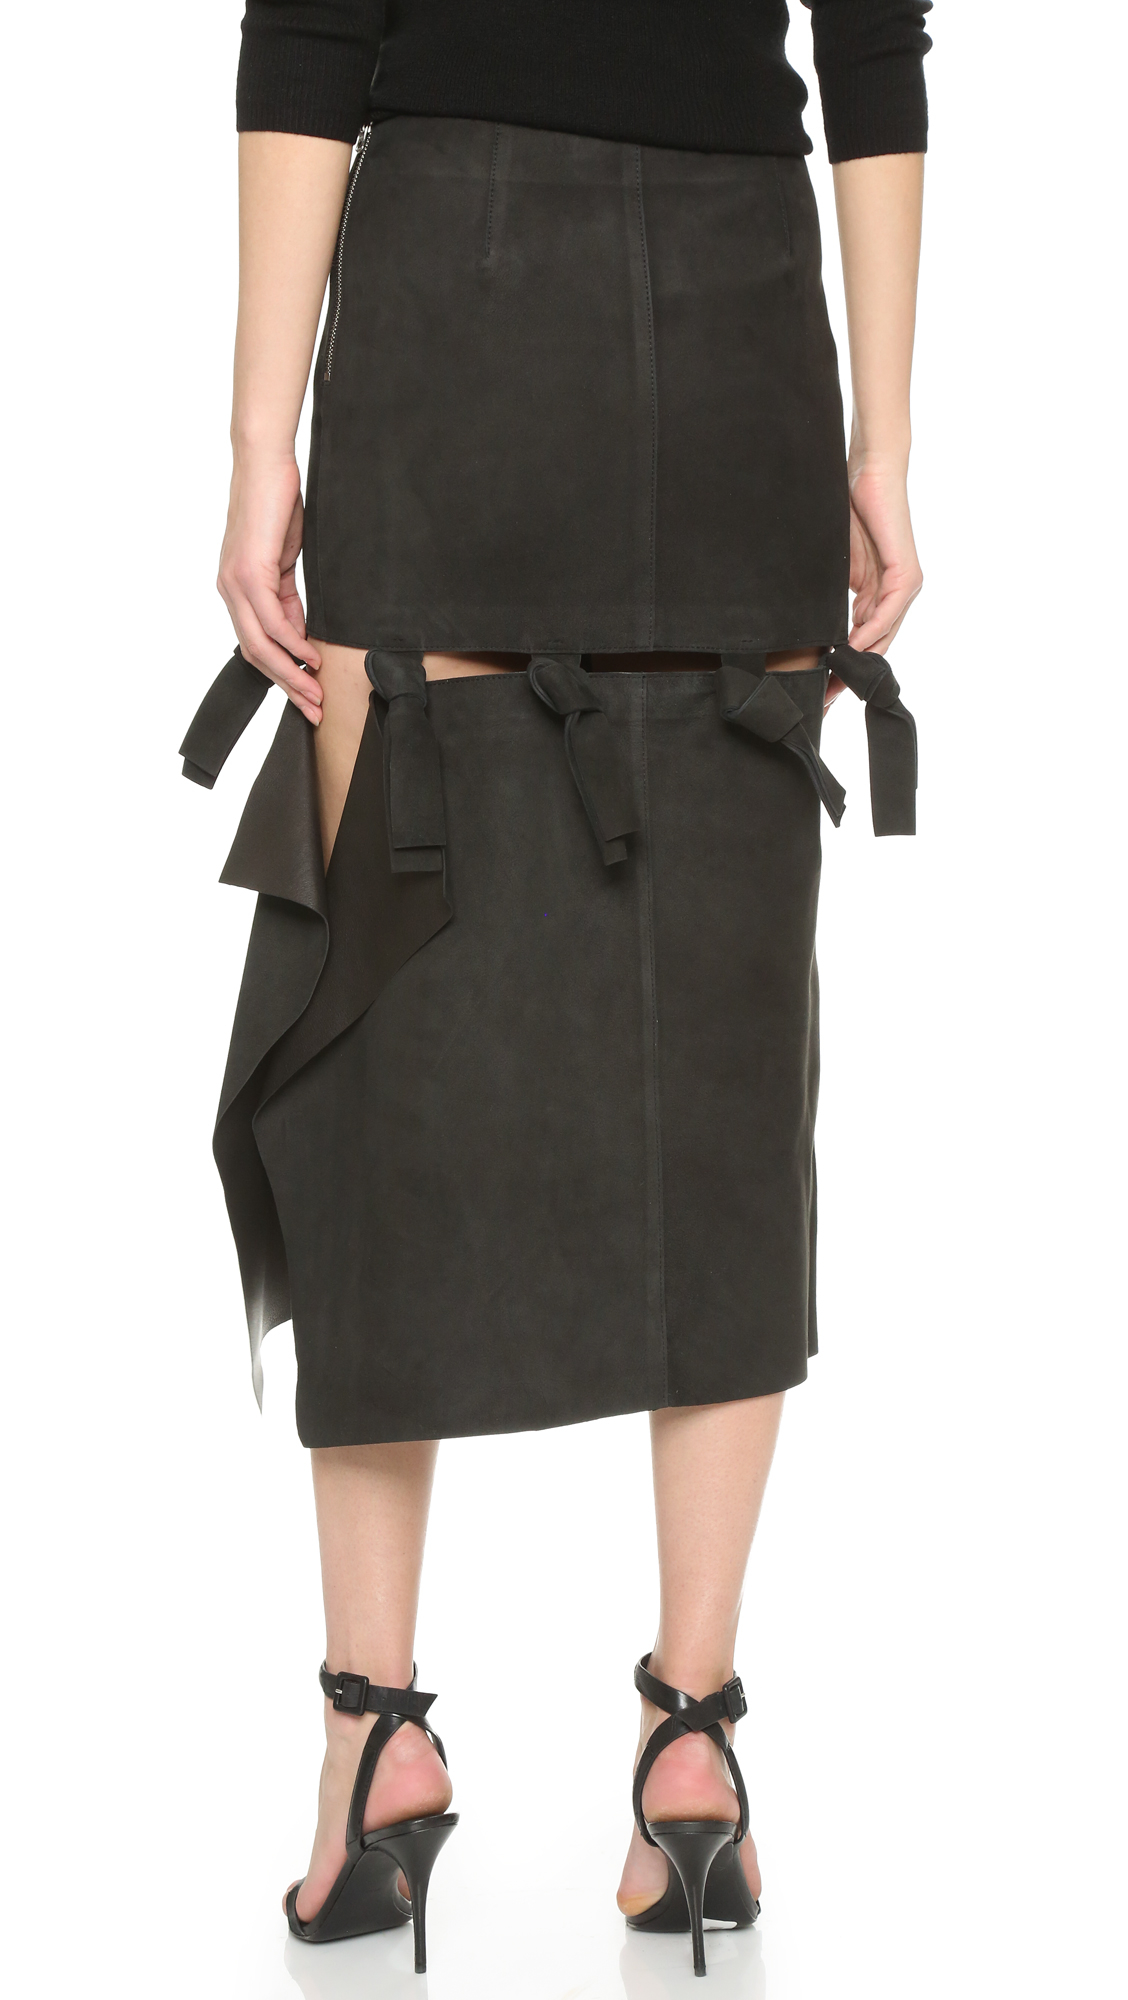 acne studios hein leather skirt in black lyst